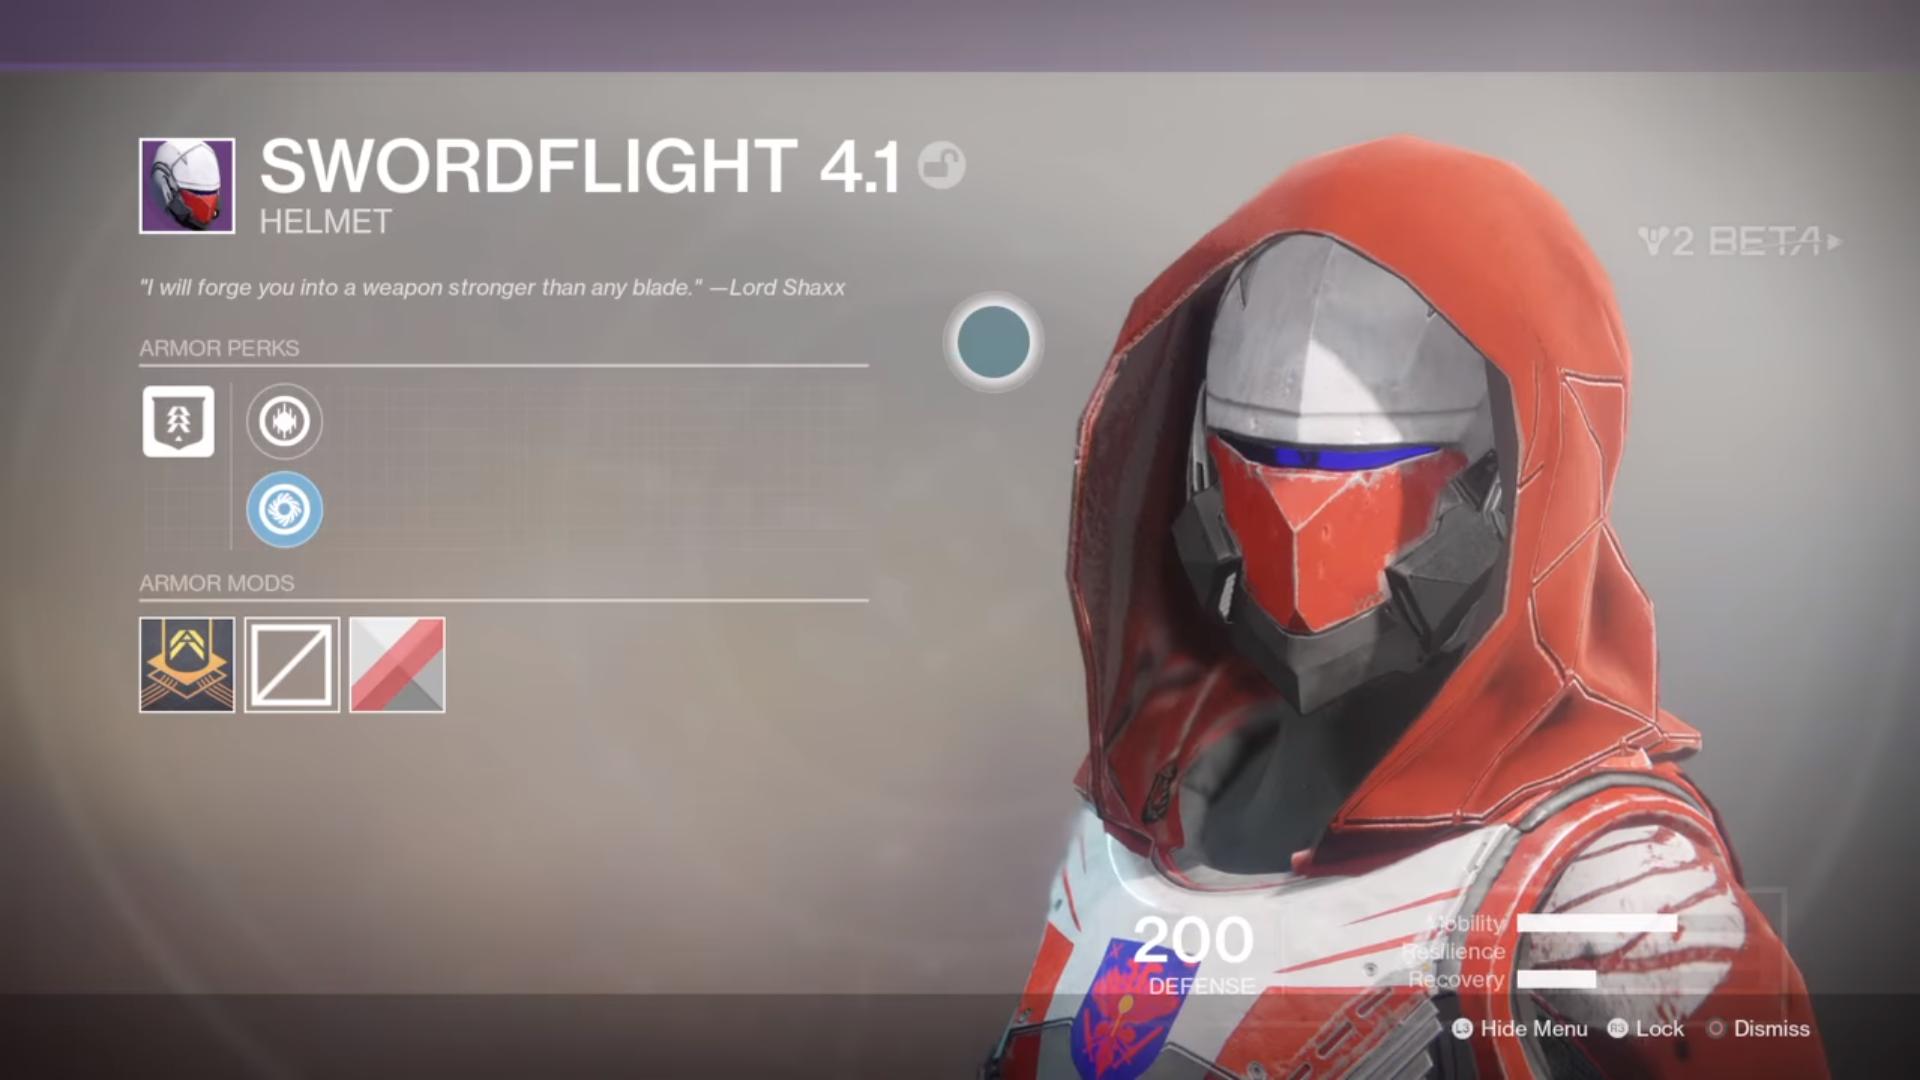 destiny 2 beta swordflight 4.1 helmet